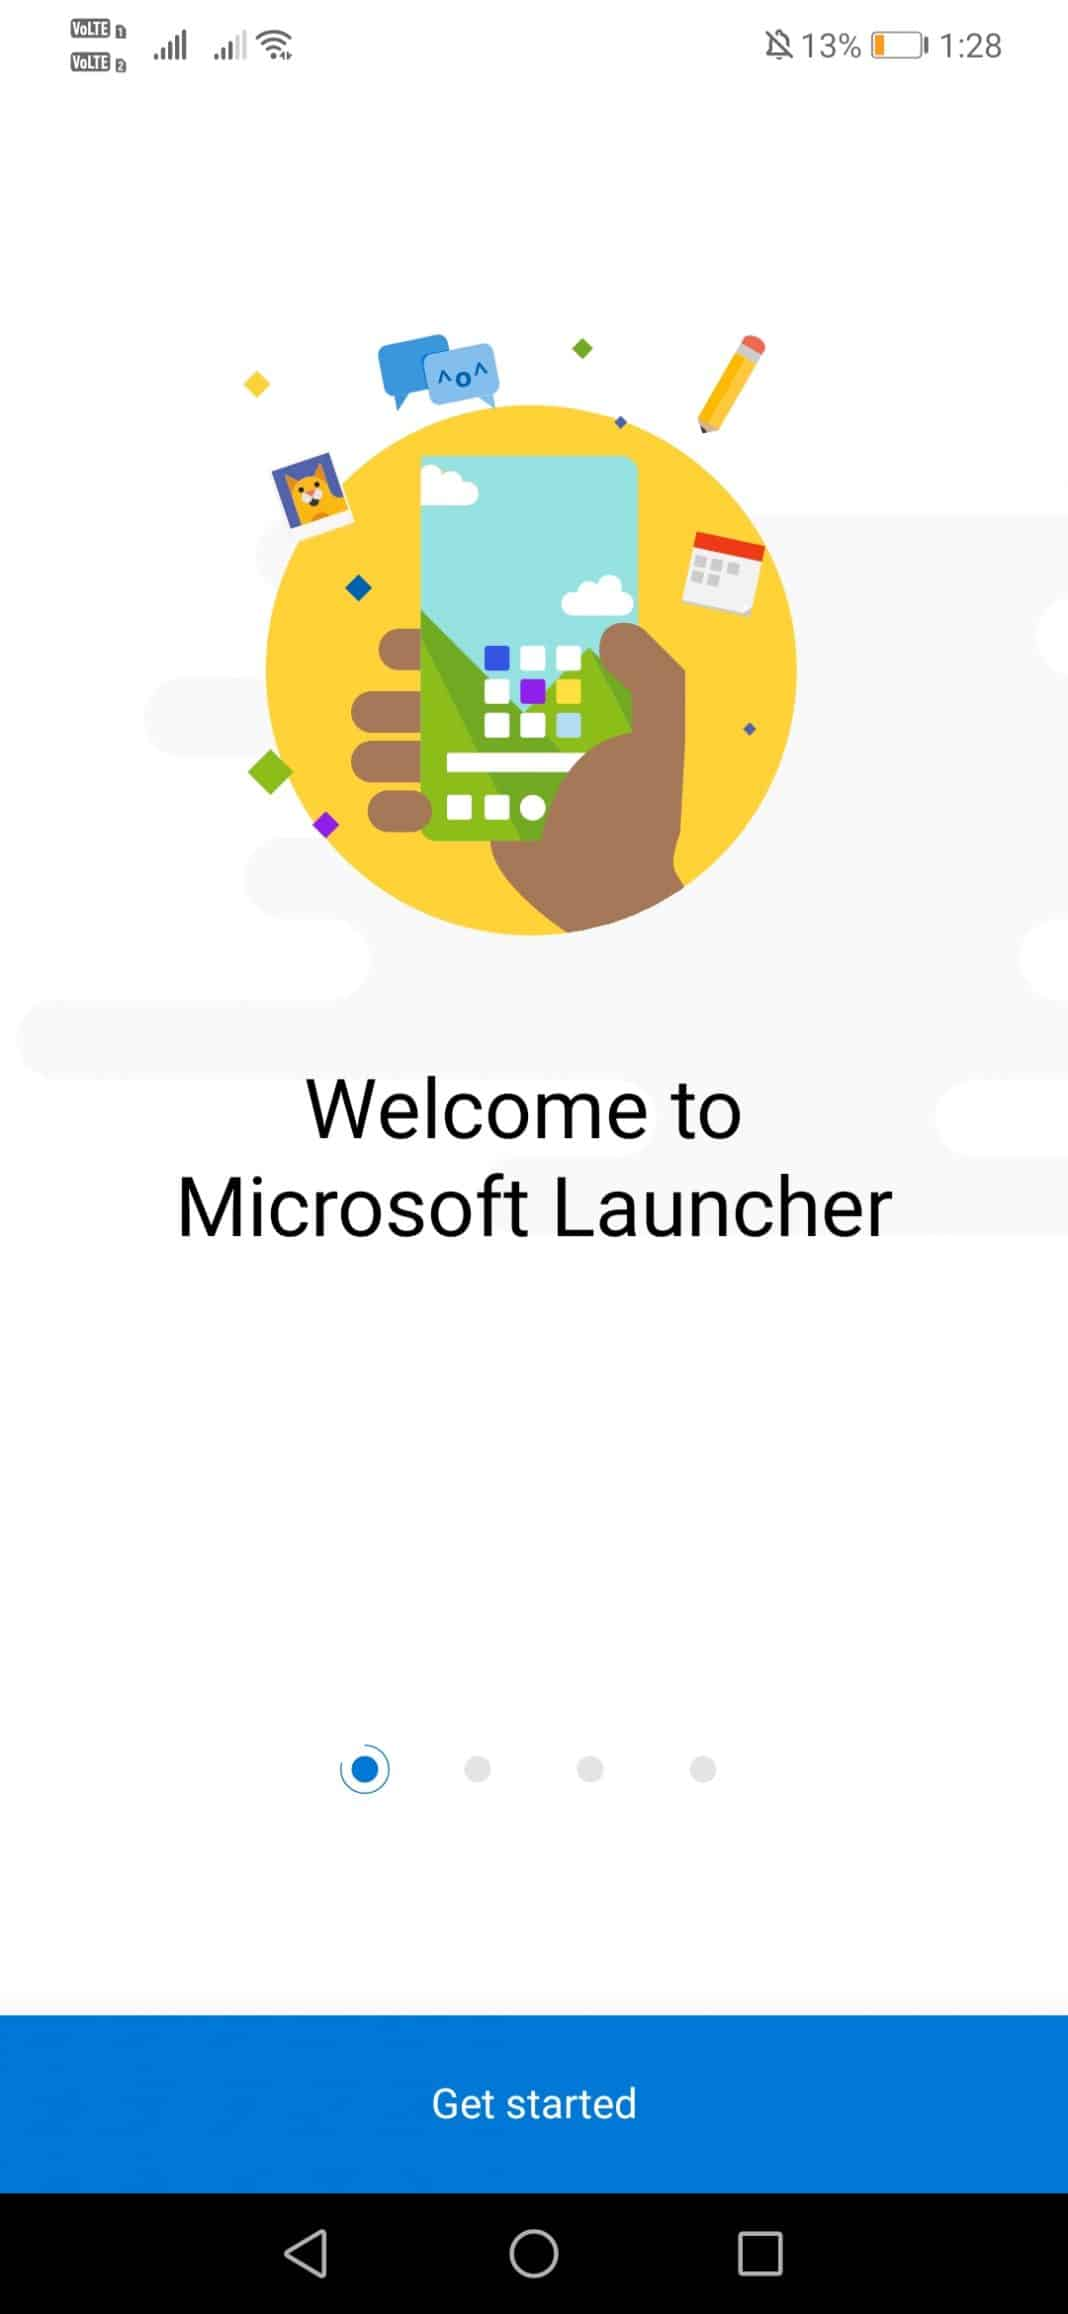 Open Microsoft Launcher